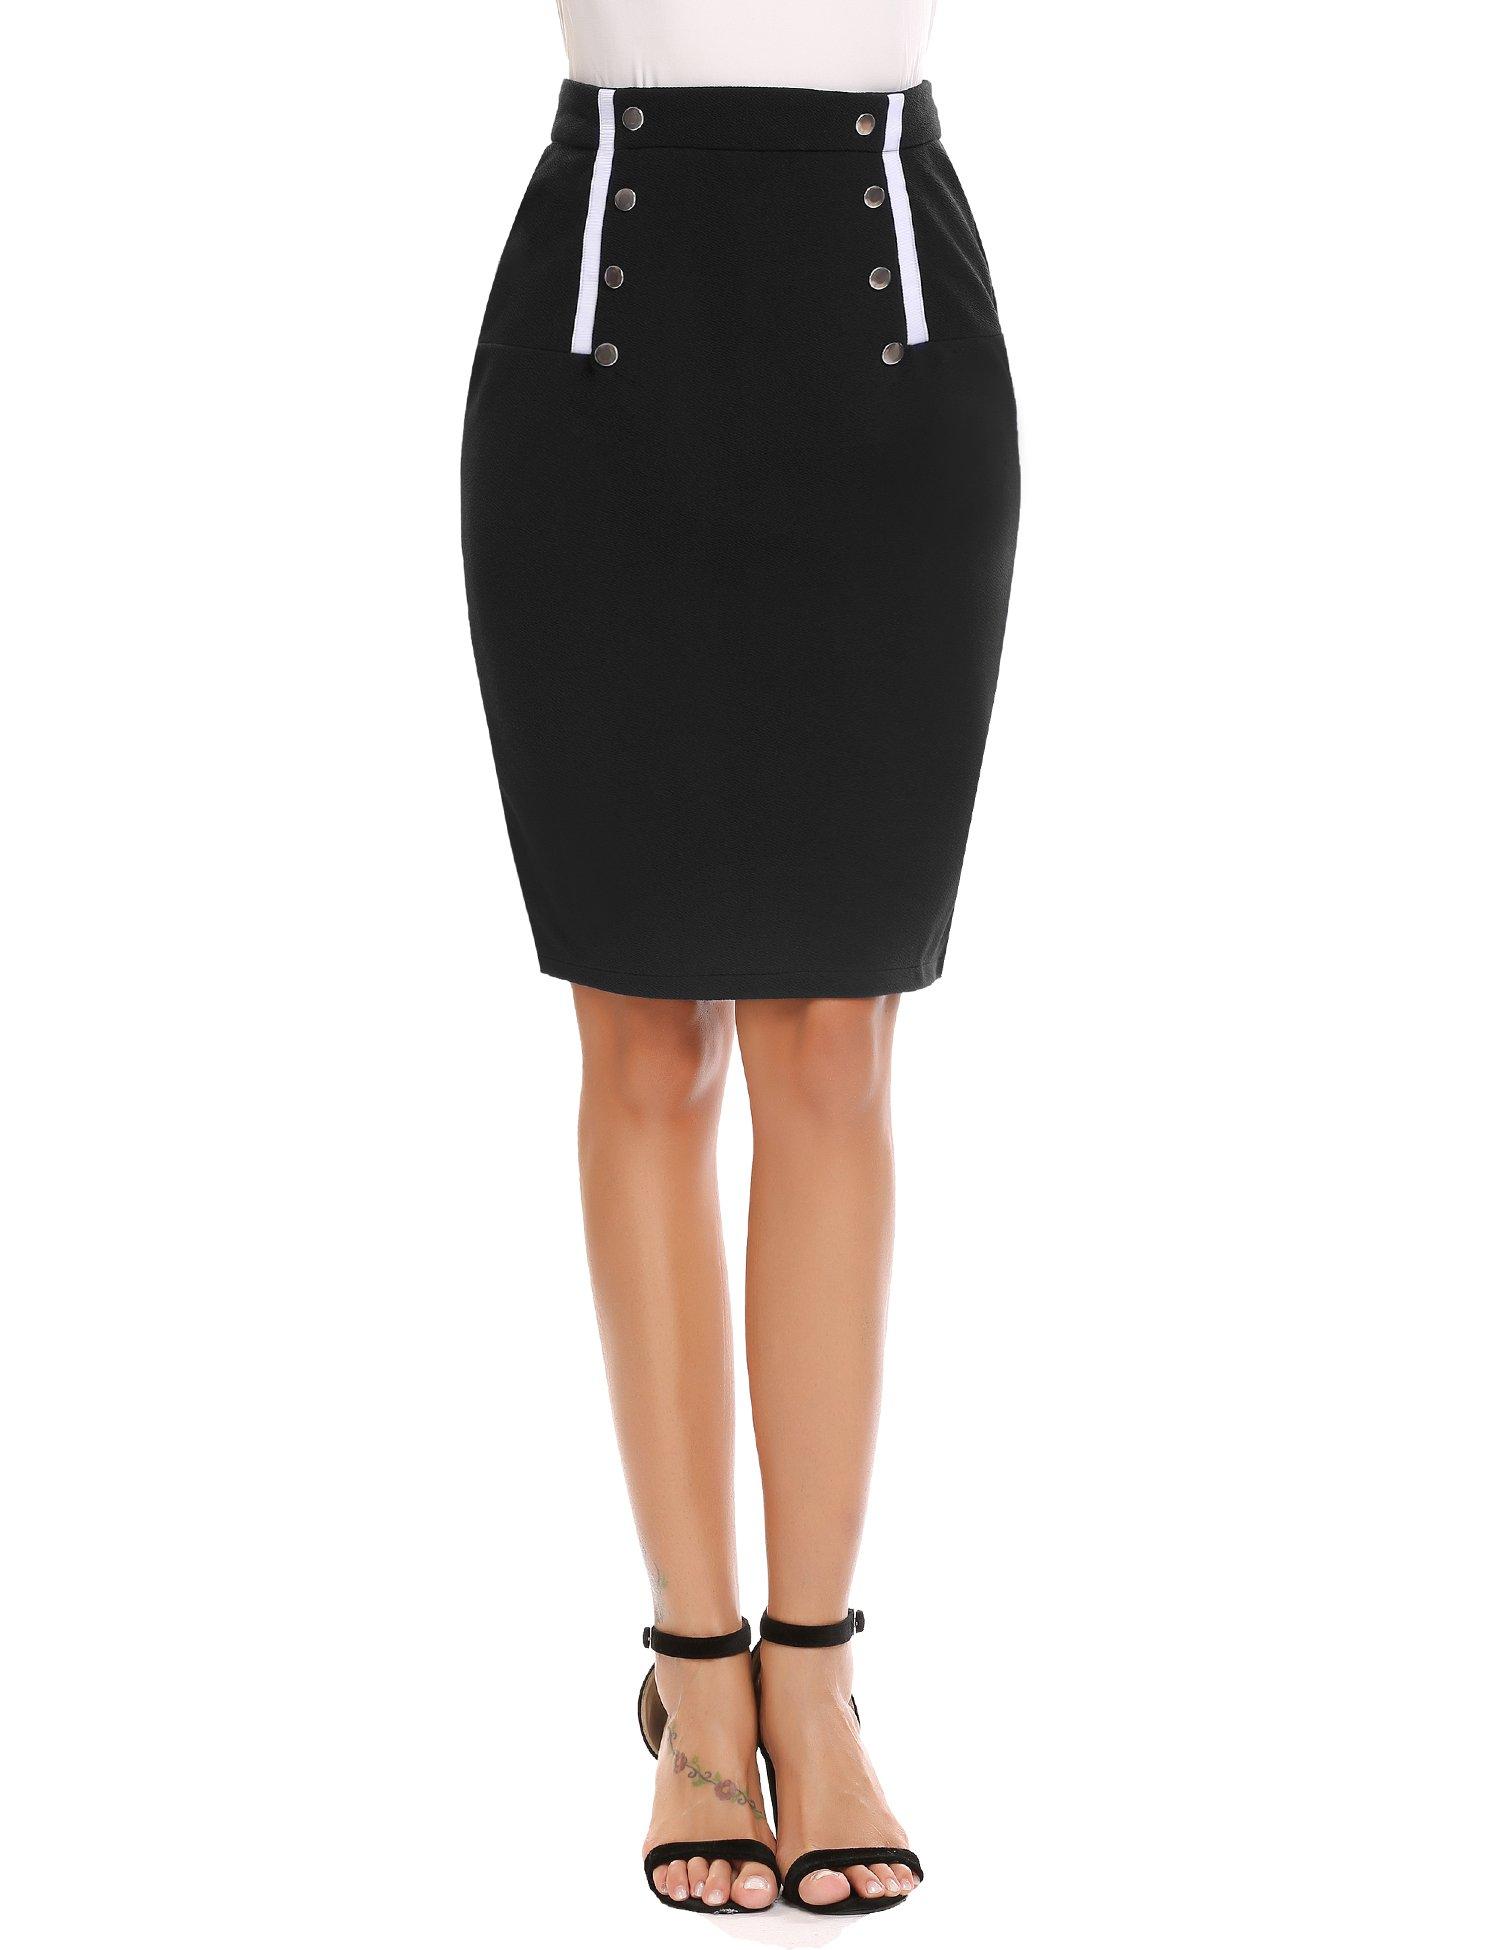 a4642a5dd4 Women's High Waist Knee Length Bodycon Pencil Skirt for Work Front Metal  Button Down Detail Pencil Skirt